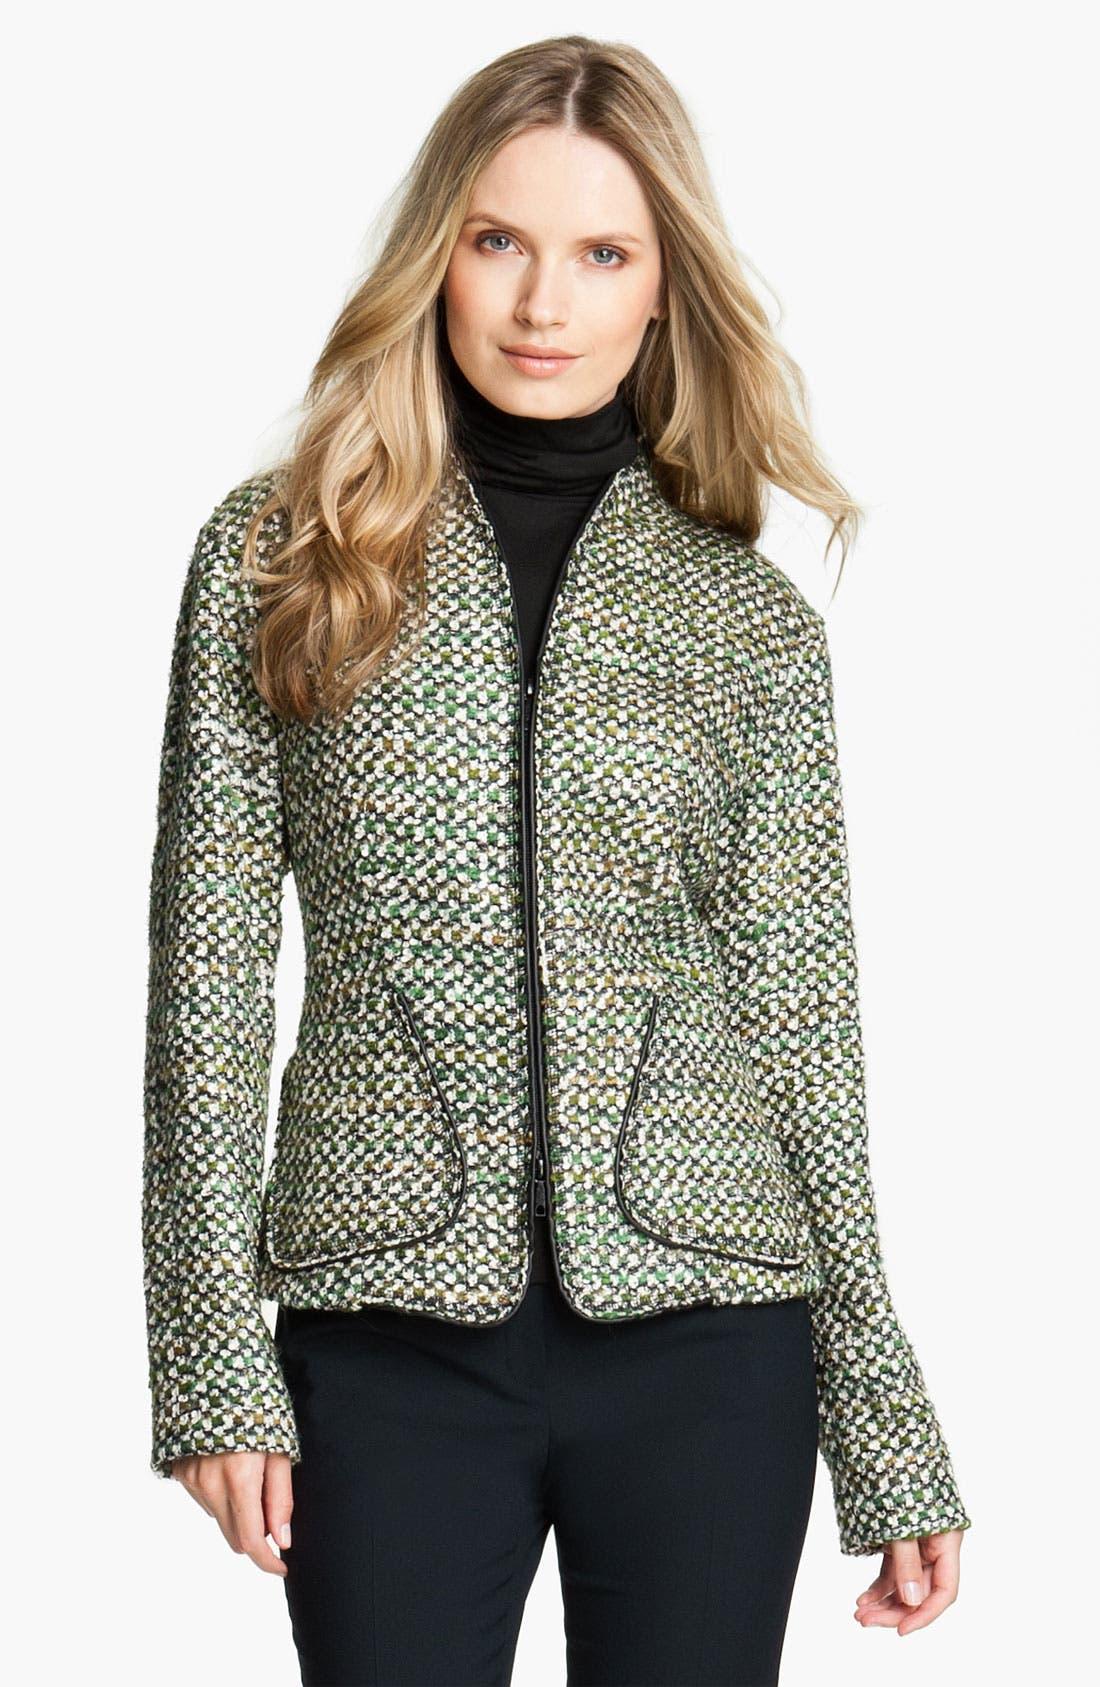 Alternate Image 1 Selected - Lafayette 148 New York 'Hierarchy' Tweed Jacket